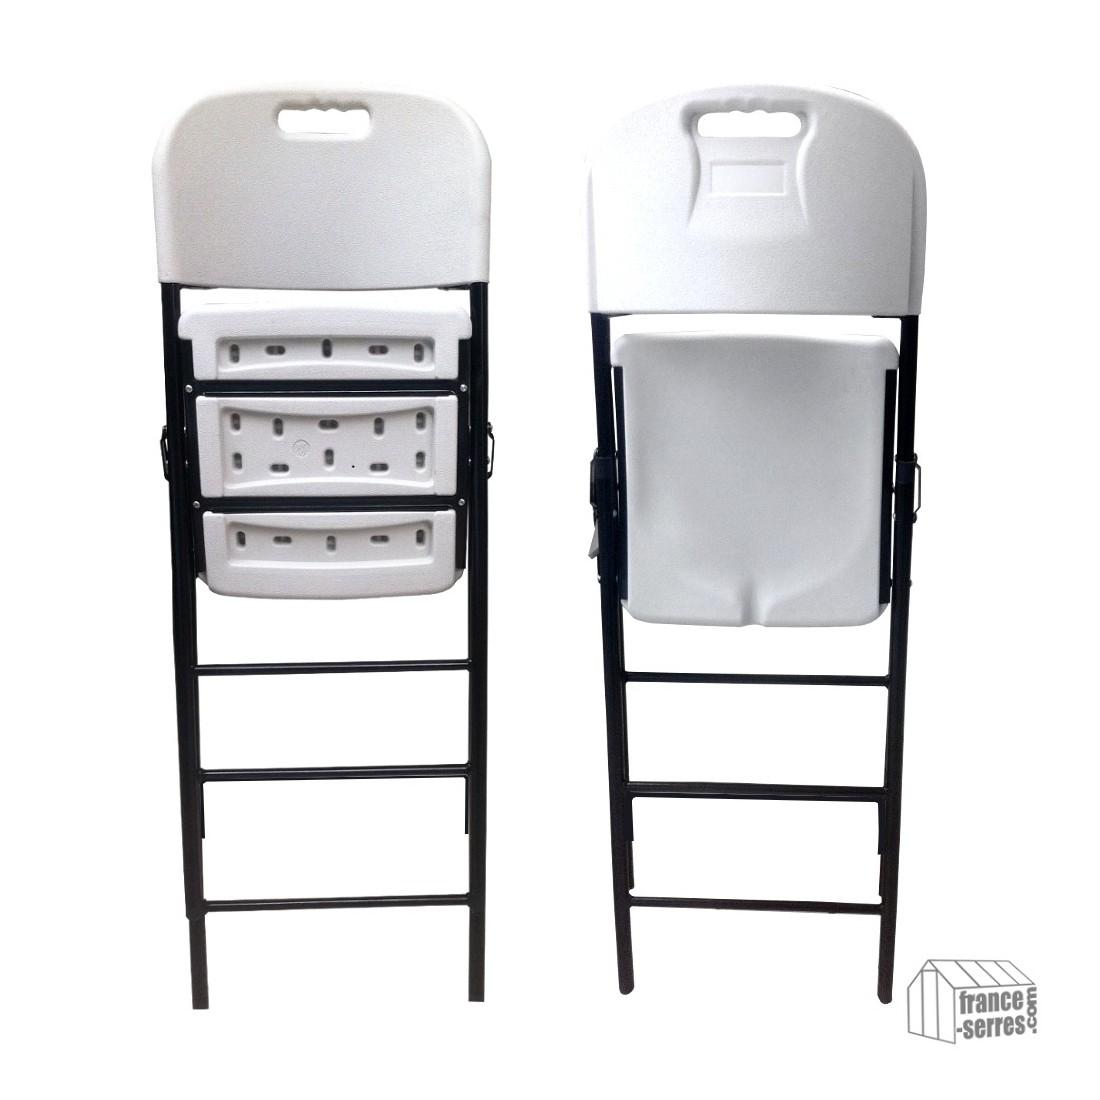 nos chaises tabourets hauts sont particuli rement robustes. Black Bedroom Furniture Sets. Home Design Ideas